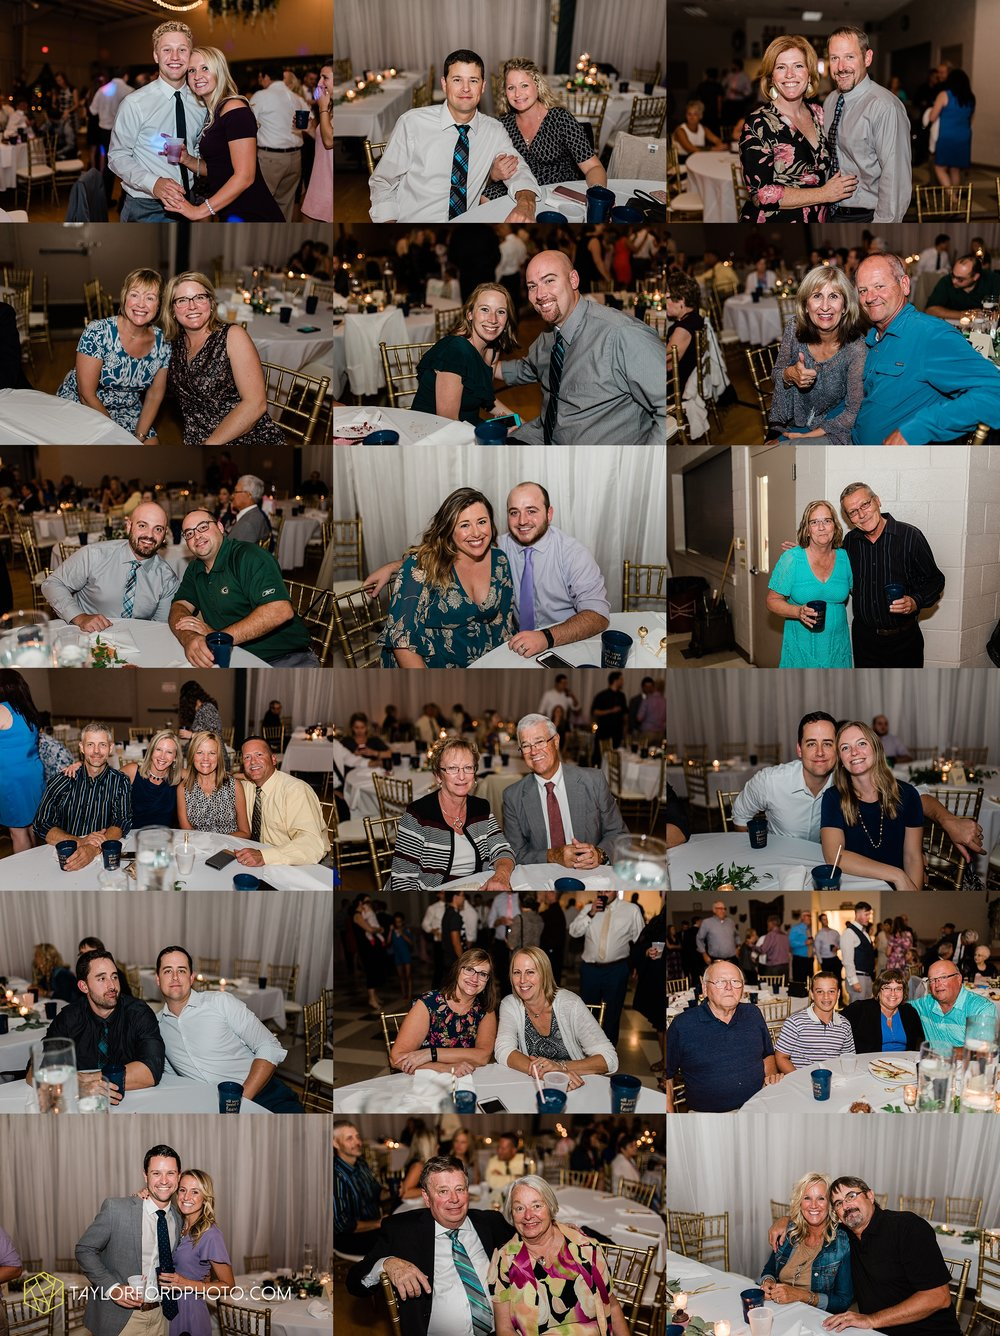 kacee-haden-sholl-second-story-saint-marys-knights-of-columbus-defiance-ohio-wedding-photographer-taylor-ford-photography_0199.jpg